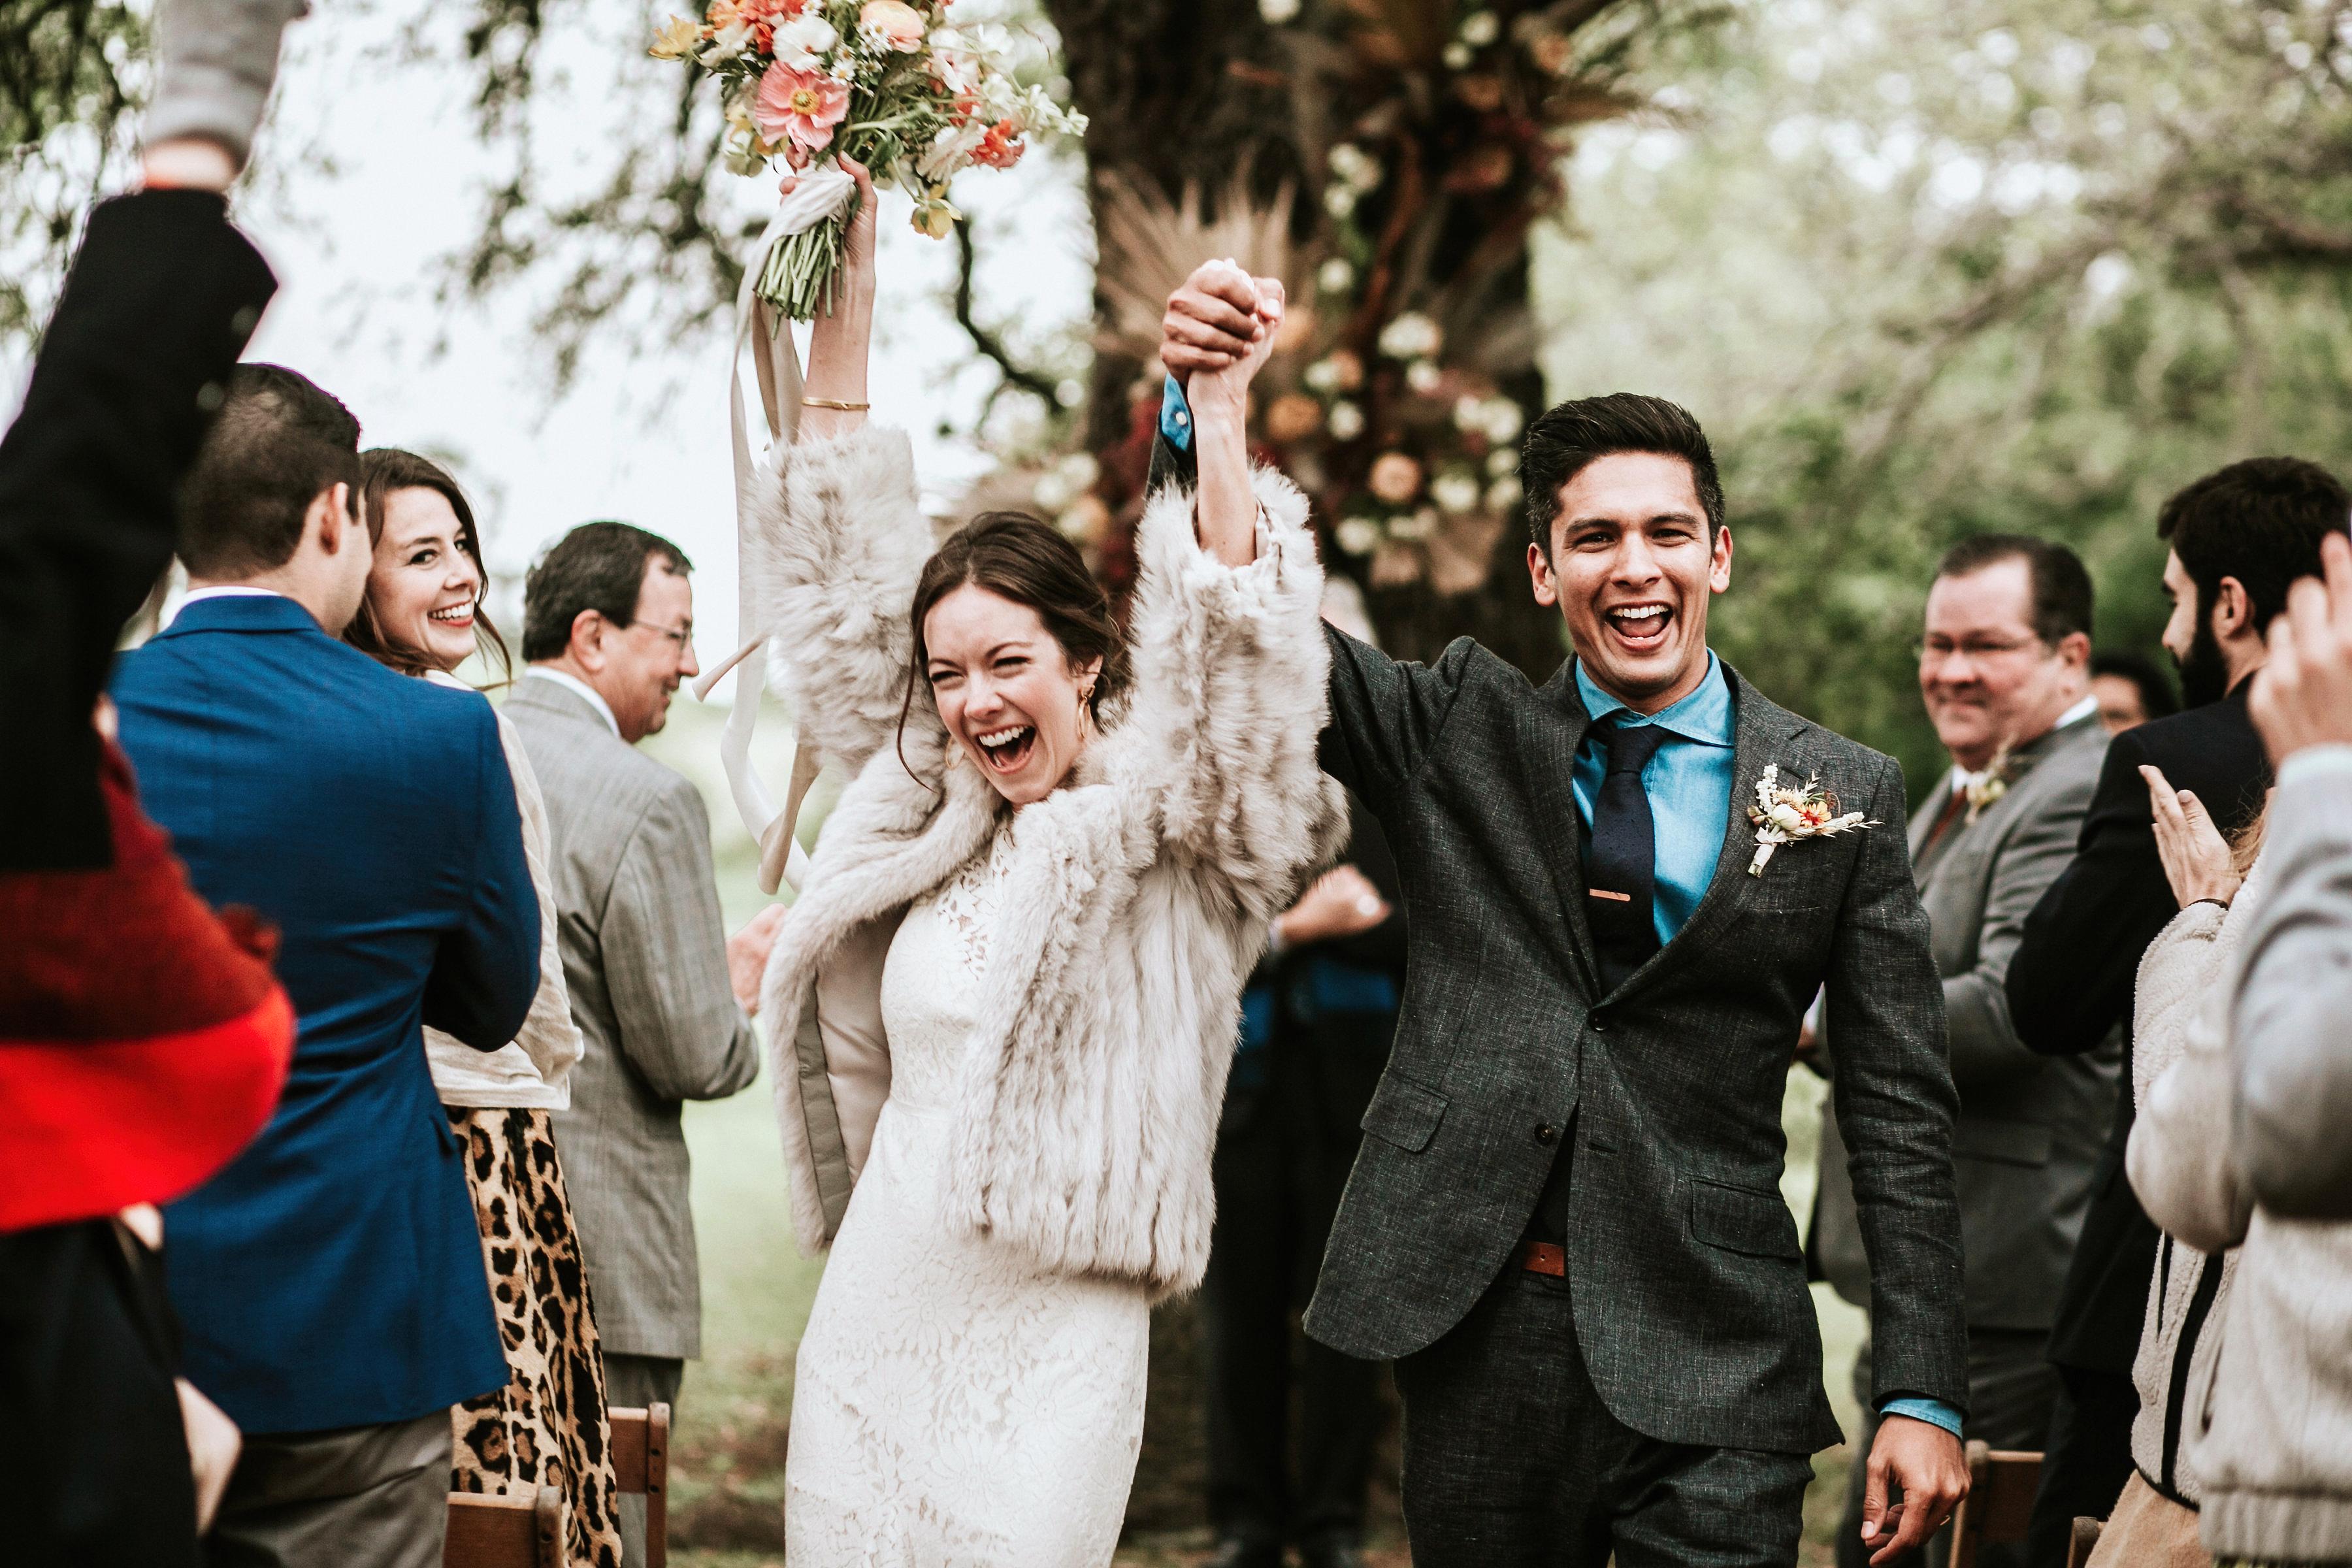 shannon jason wedding bride groom couple ceremony recessional